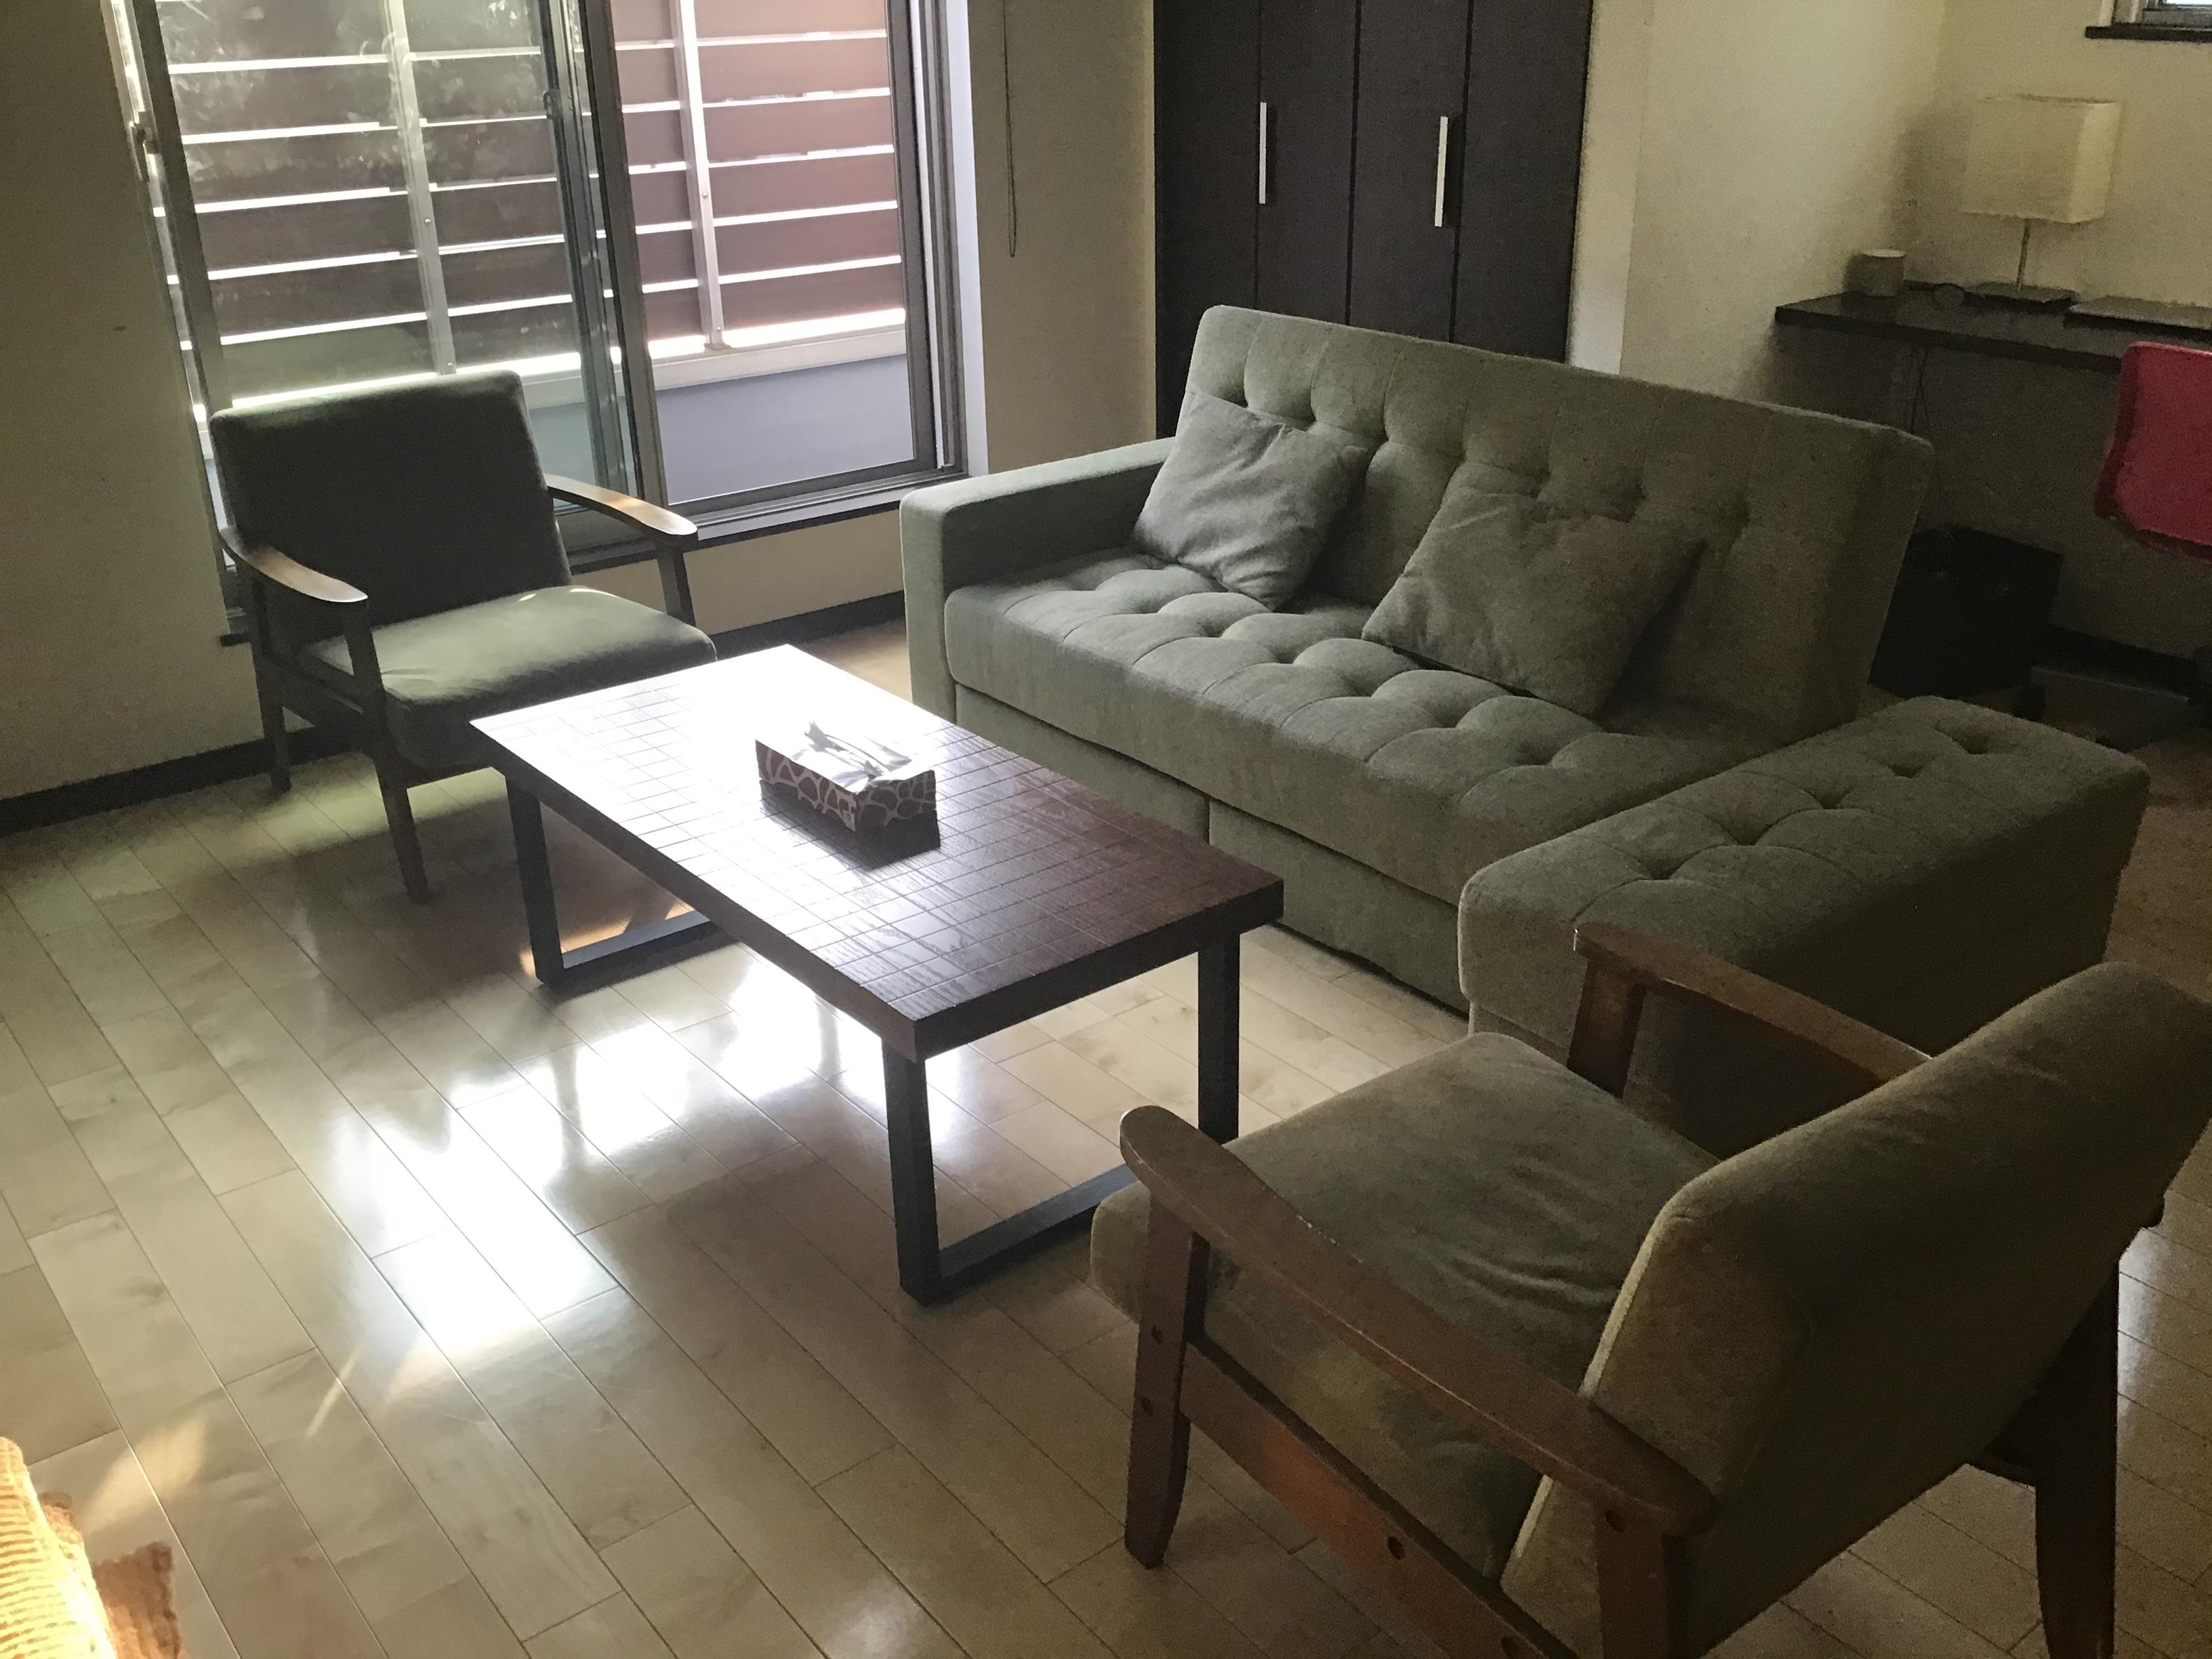 HONOHONO レンタルスペースの室内の写真